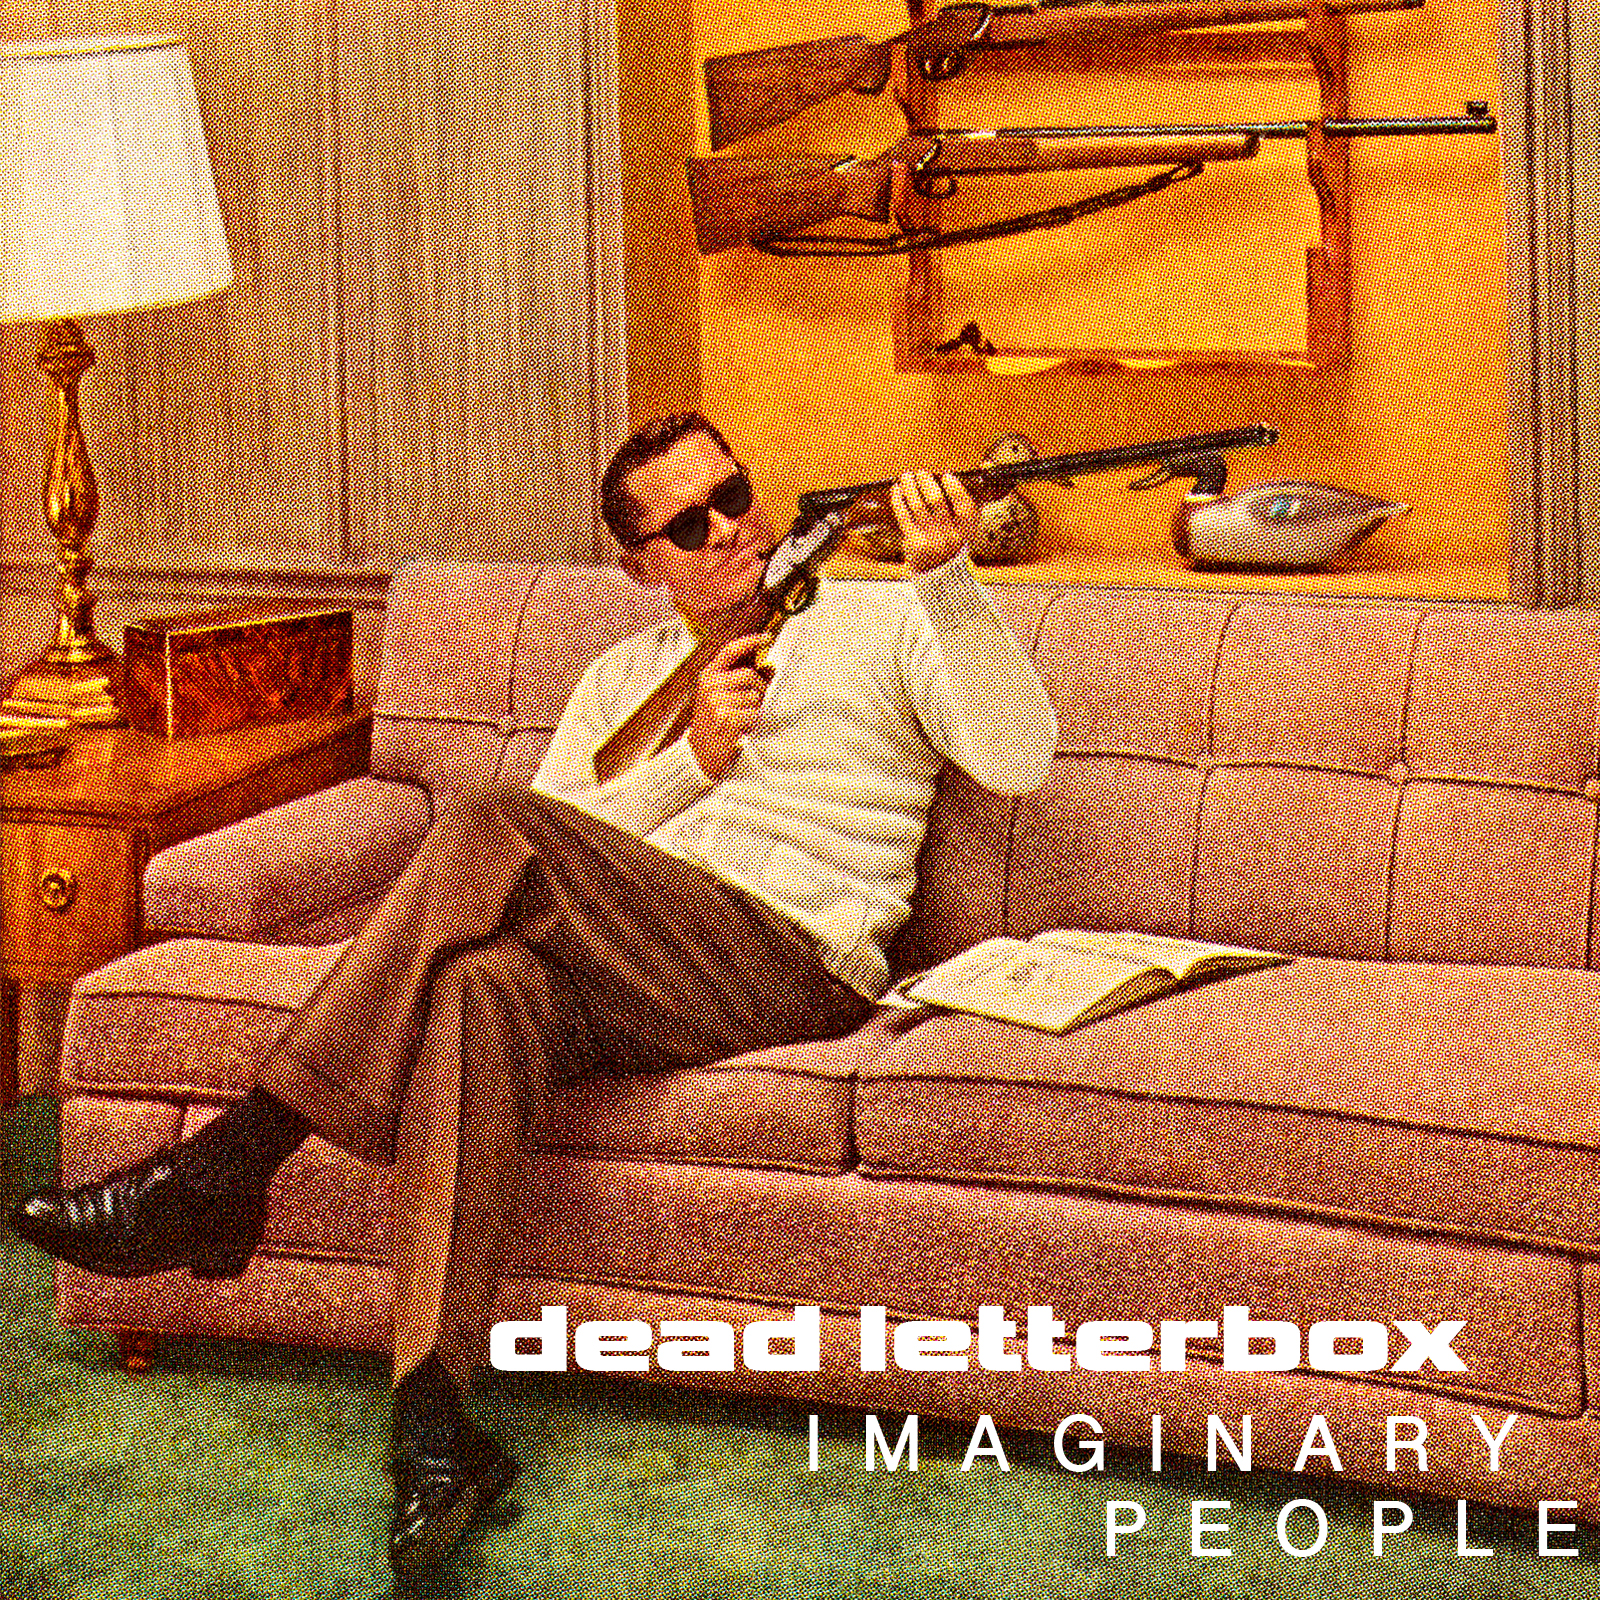 Dead-Letterbox-1600x1600.jpg